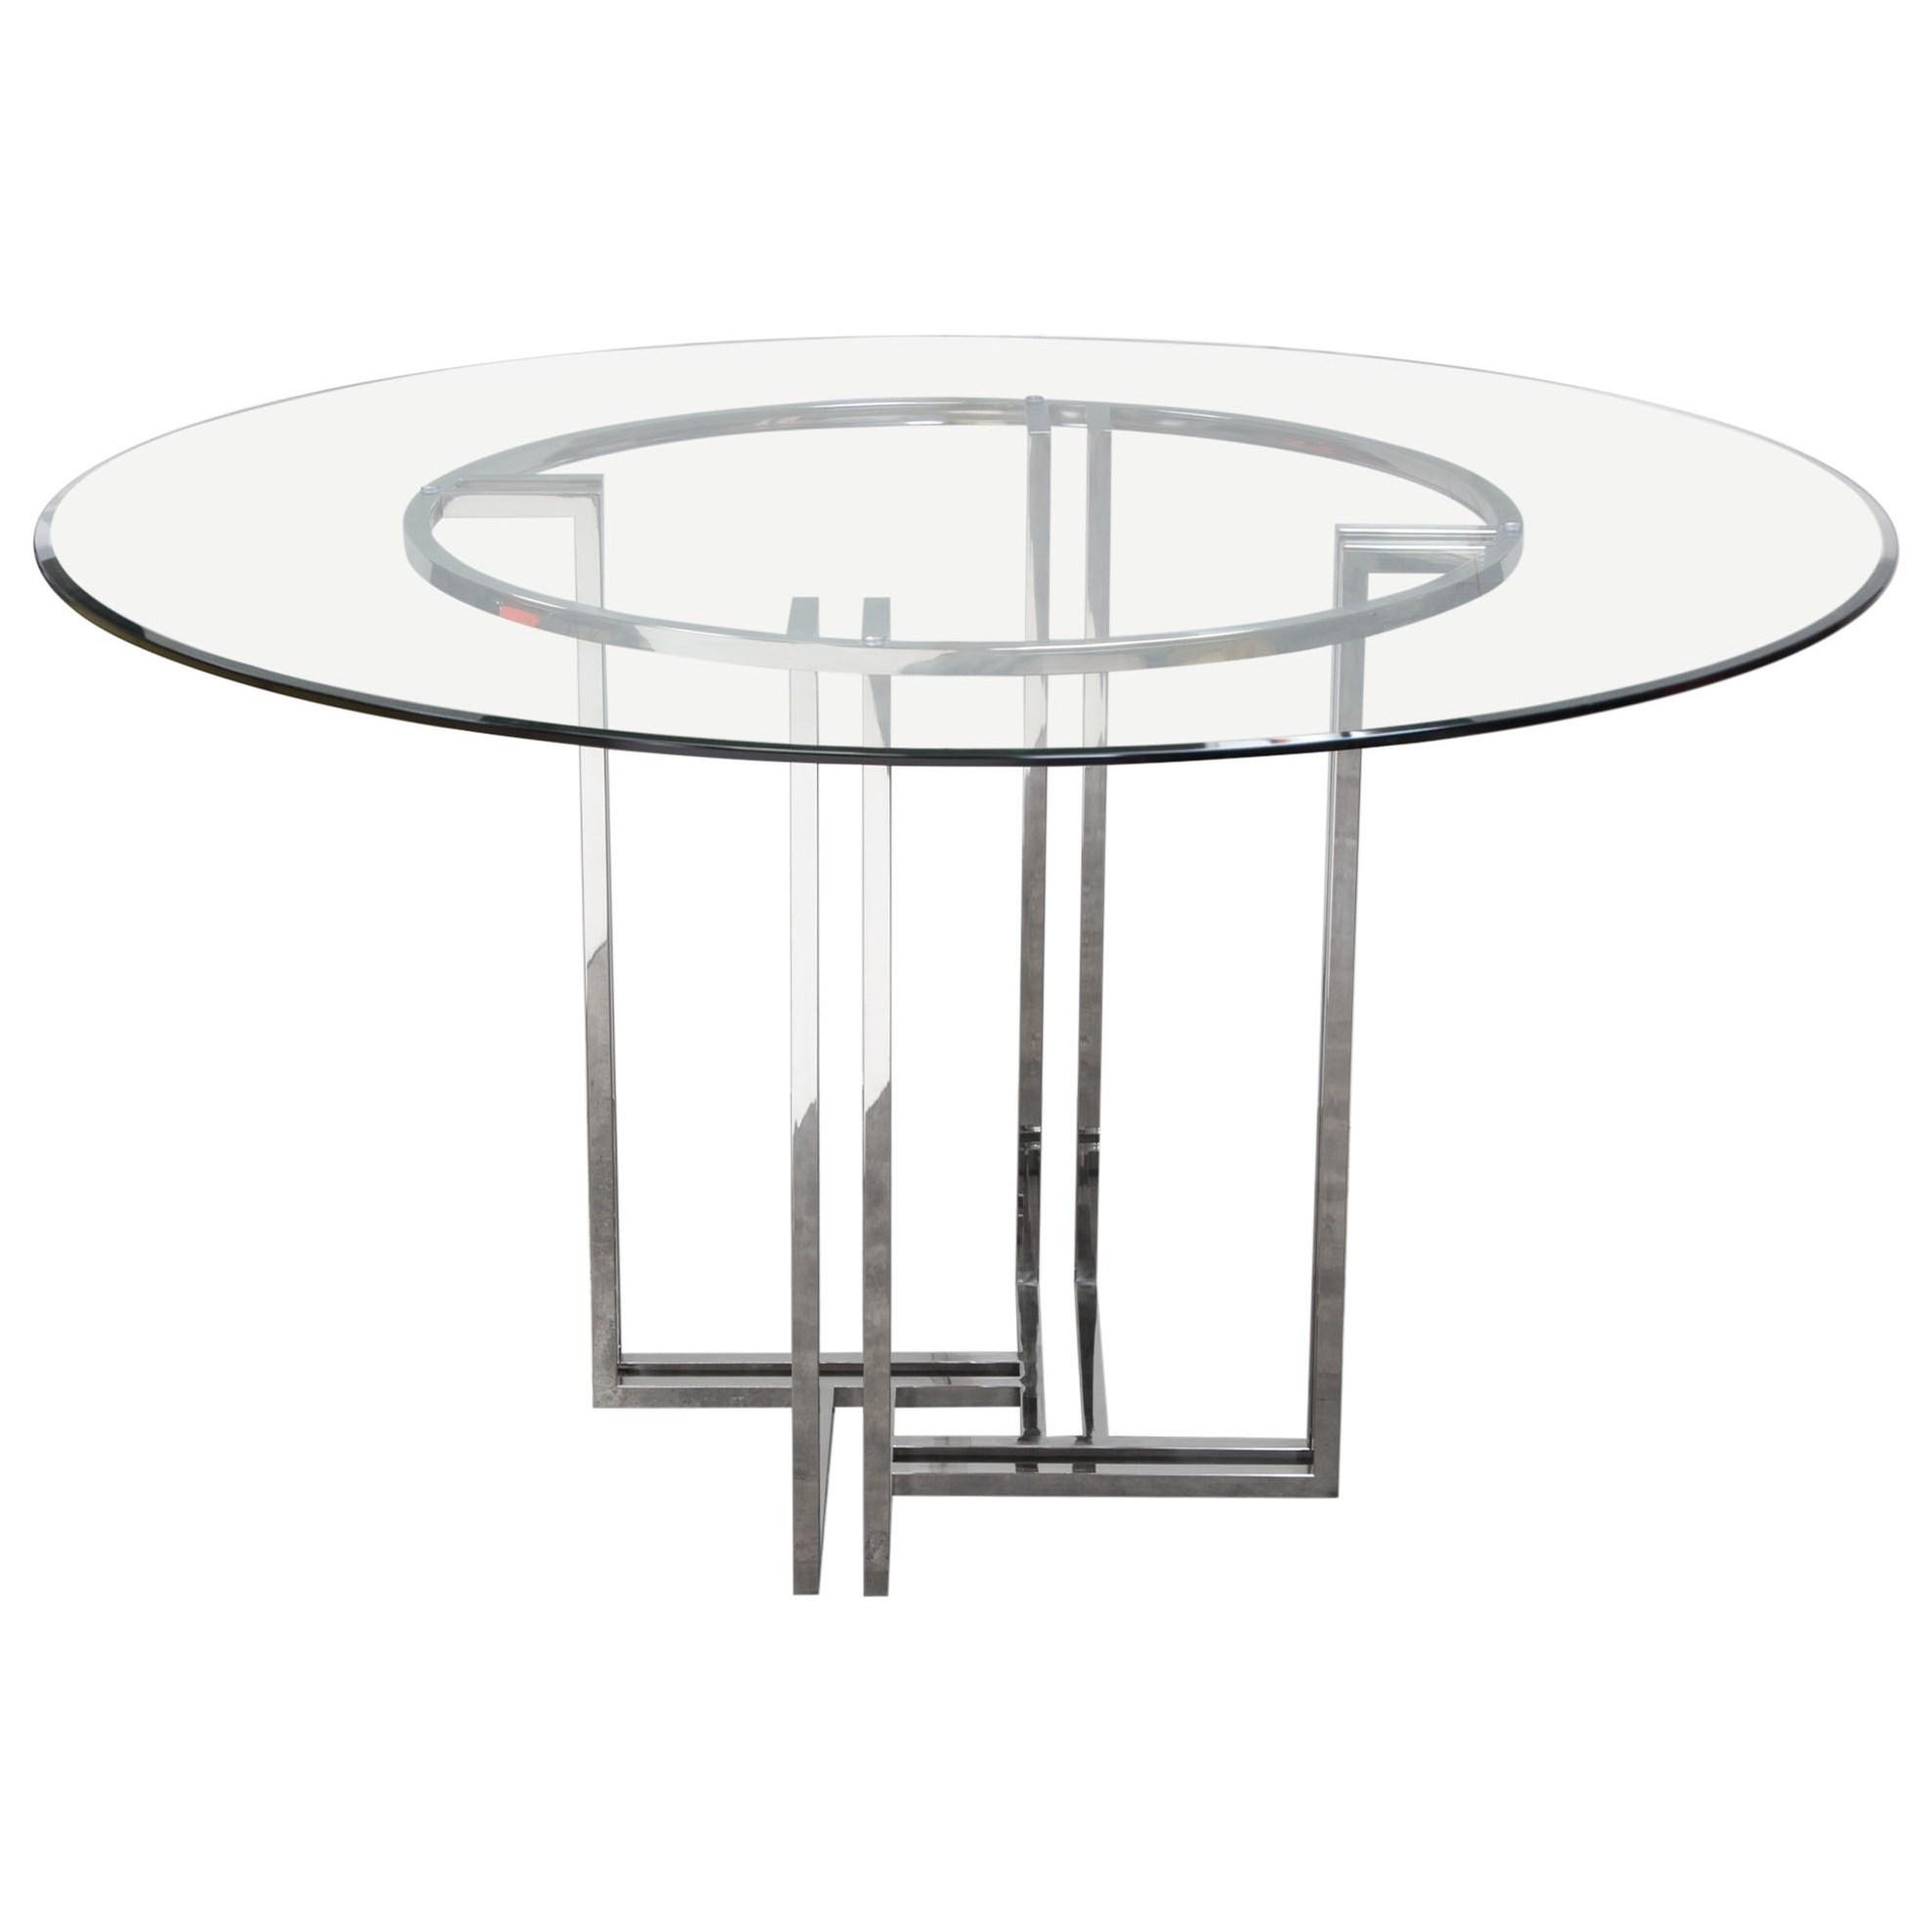 Diamond Sofa Deko Dekordt Polished Stainless Steel Round